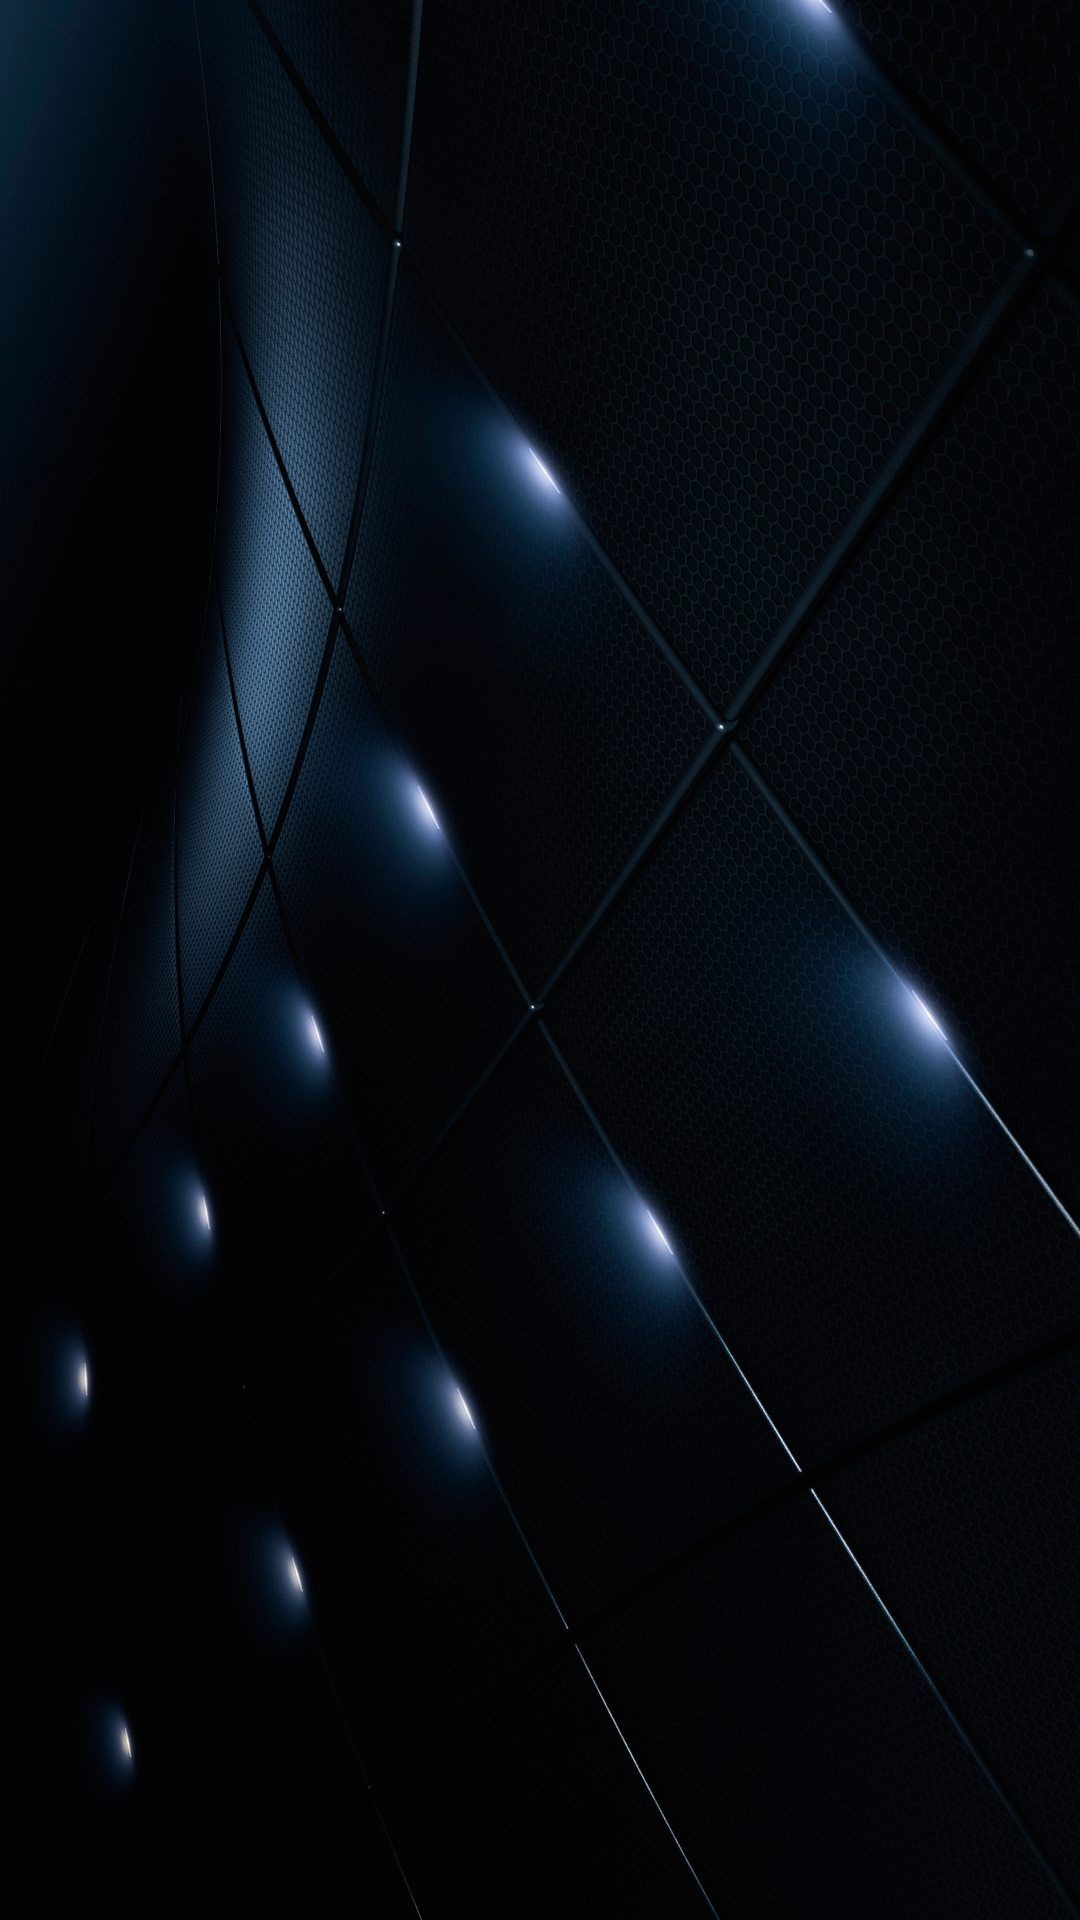 Res: 1080x1920, Wallpaper full hd 1080 x 1920 smartphone dark beautiful